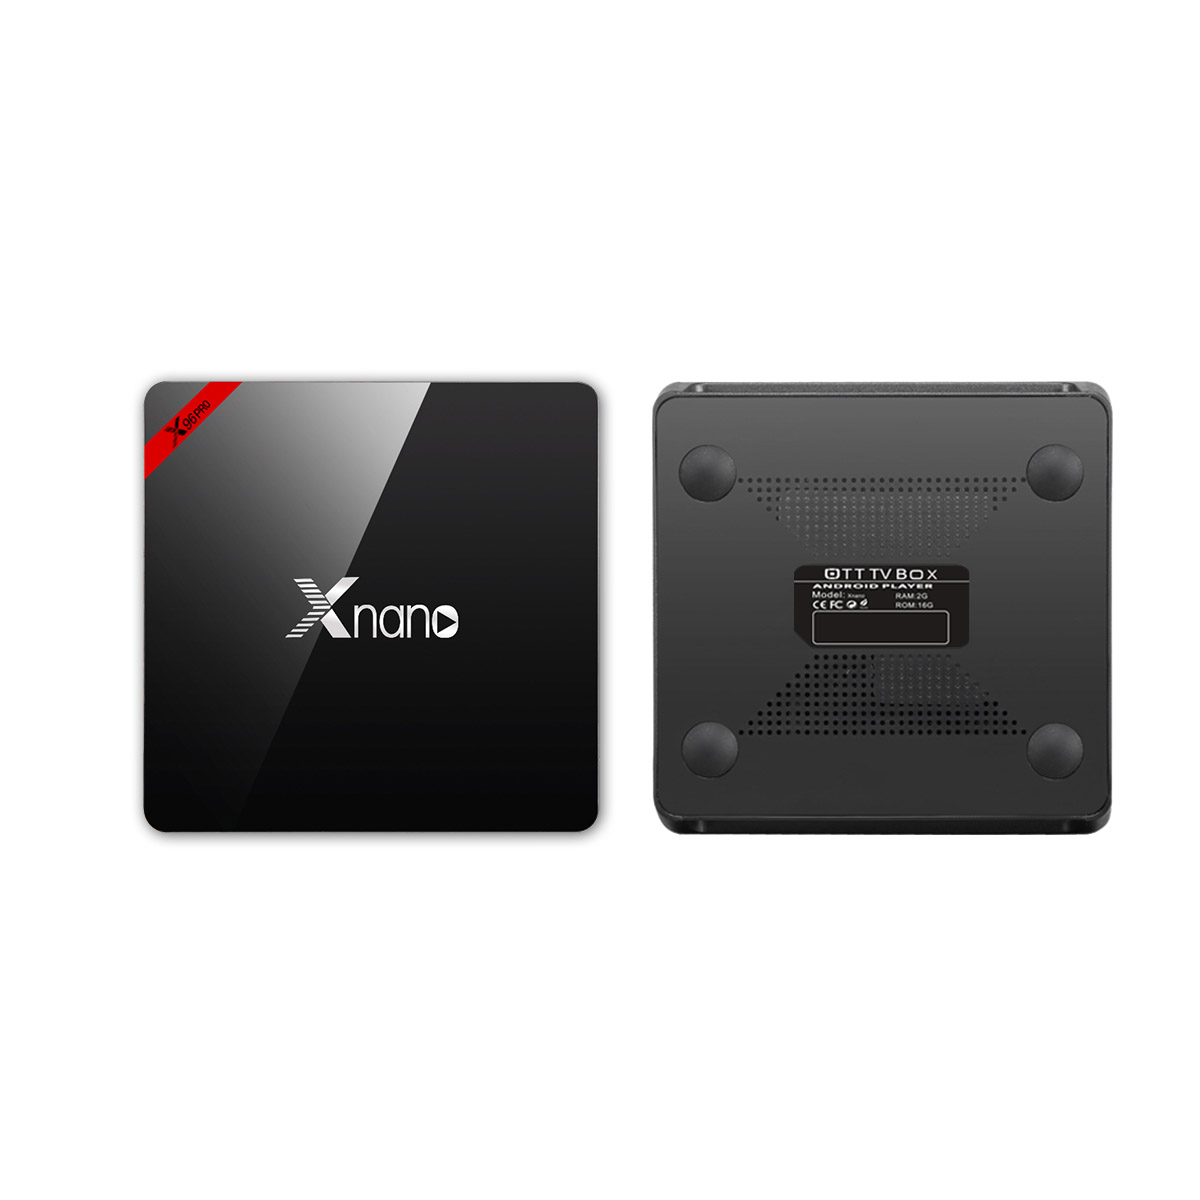 XNANO X96 PRO Amlogic S905X Quad Core TV Box 8G 16G Android 6.0 ...